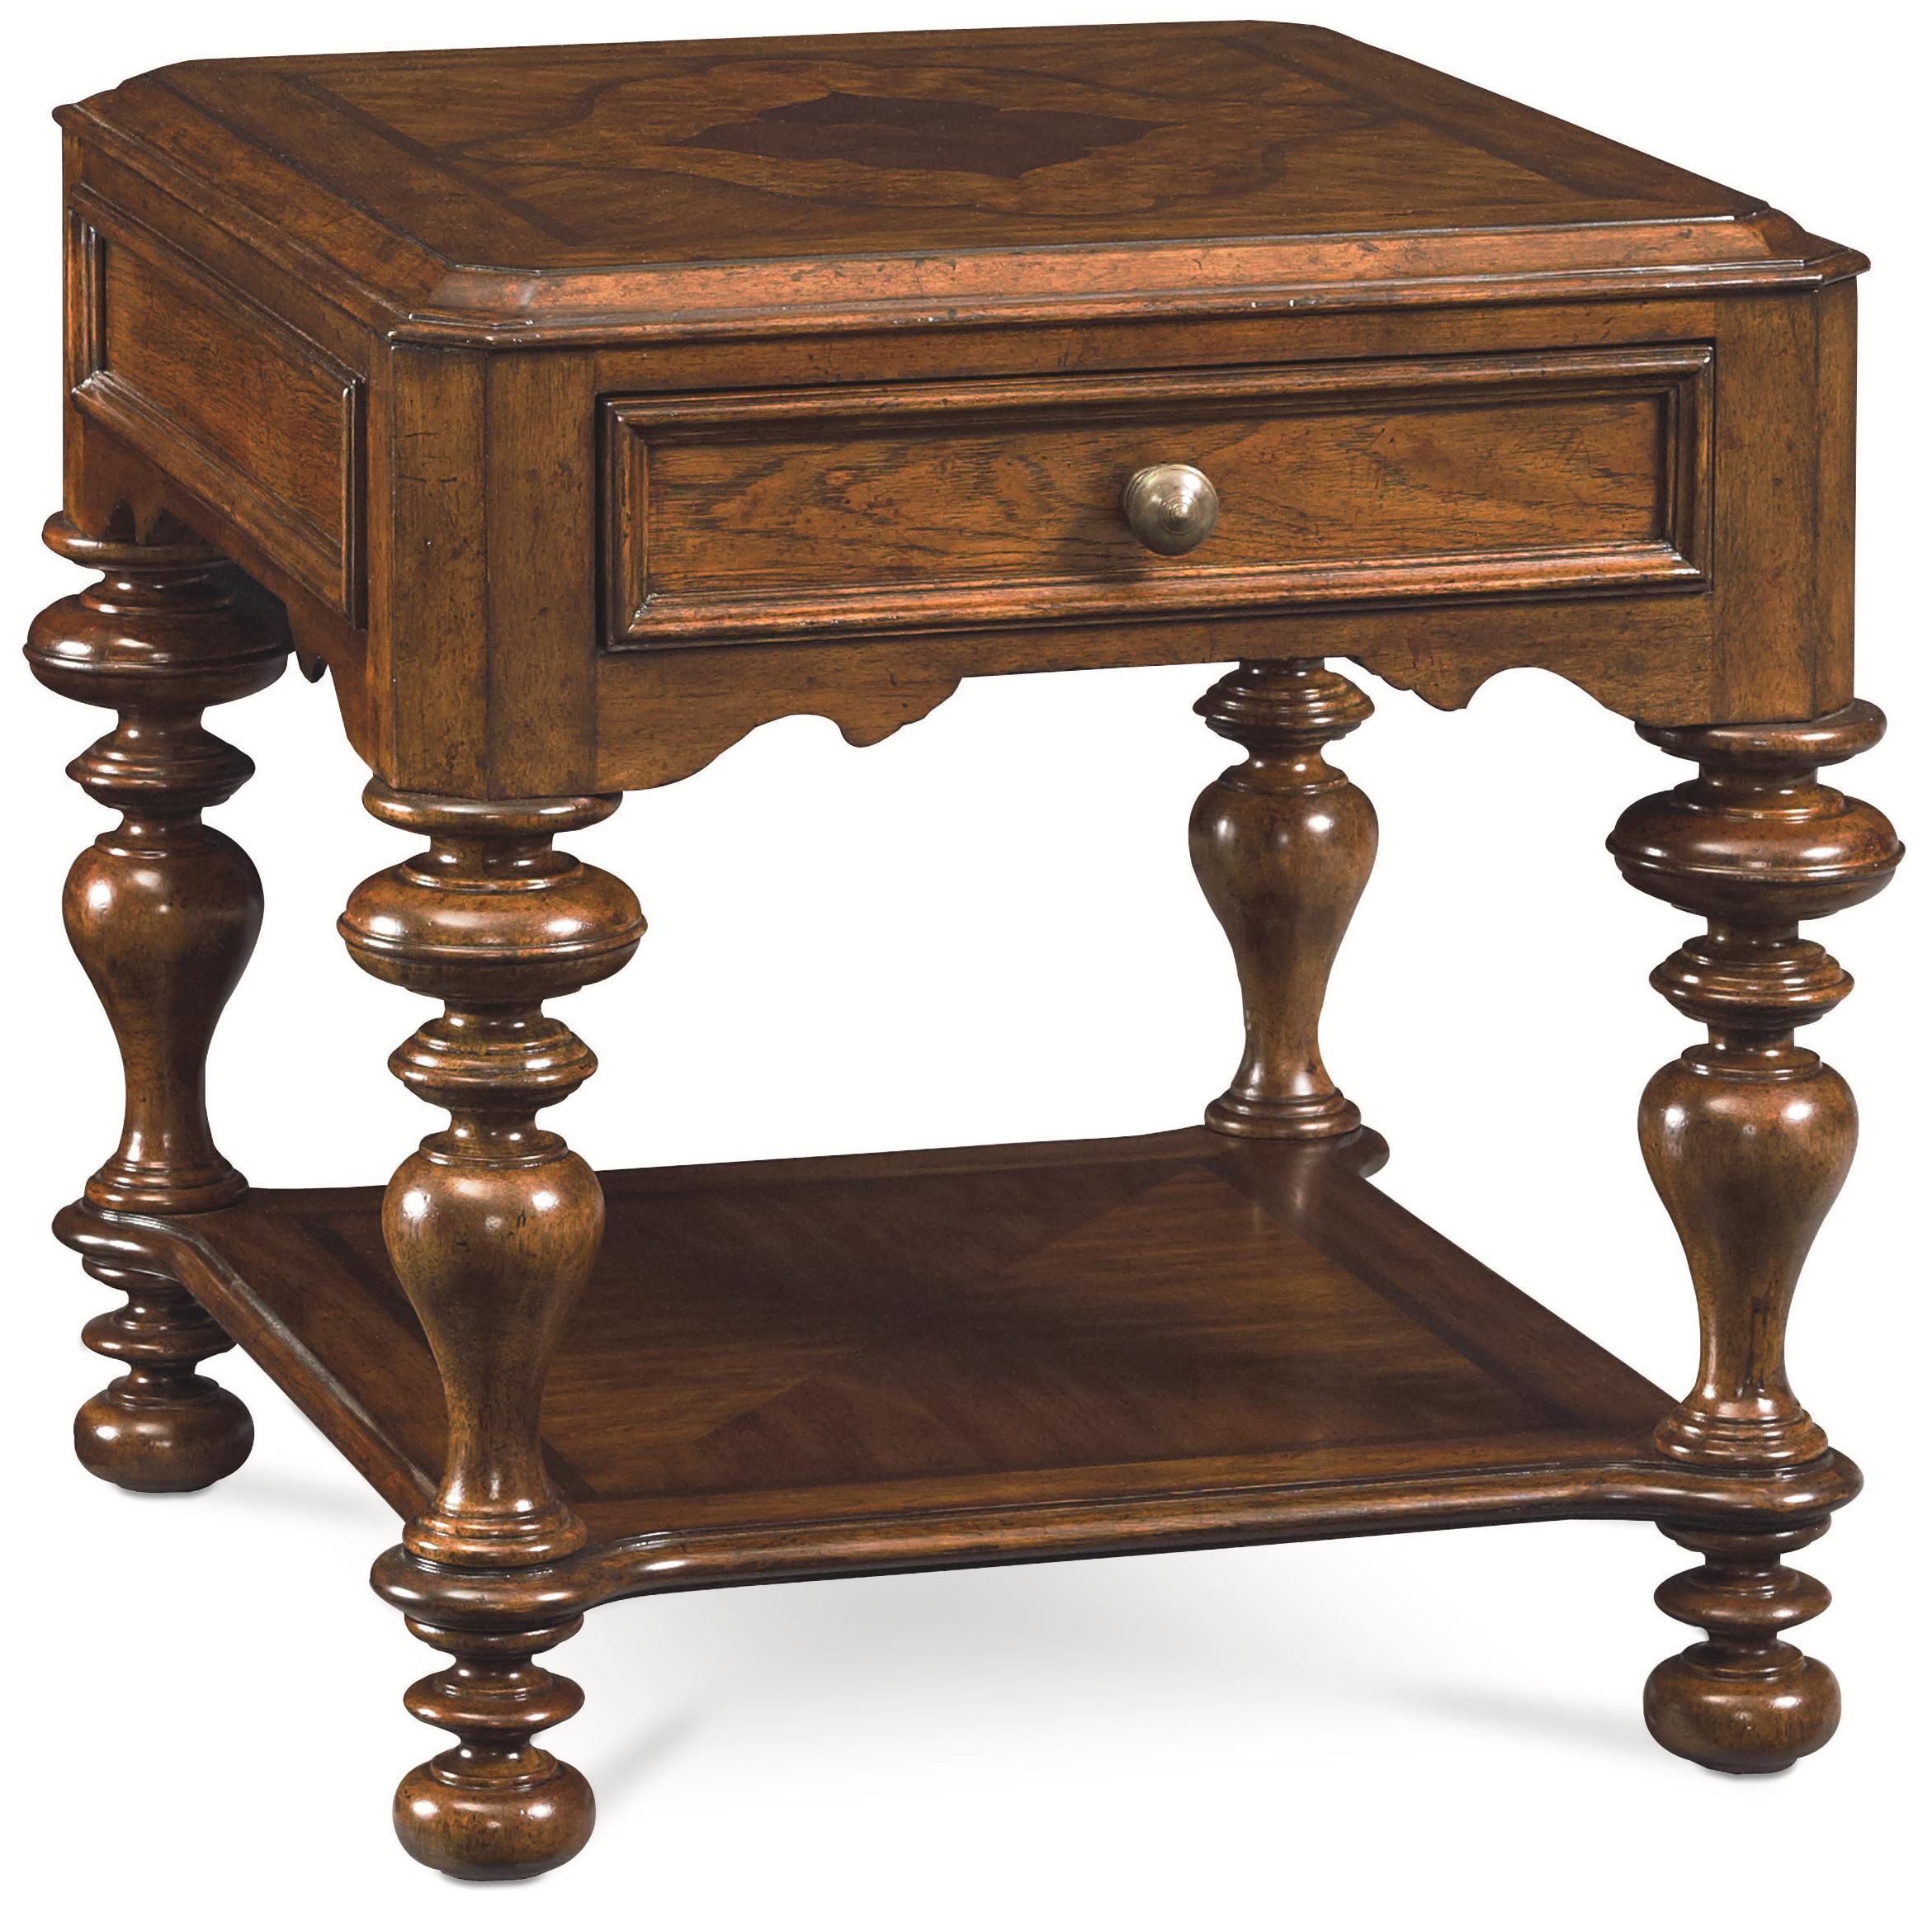 Thomasville® Cassara Drawer End Table - Item Number: 46931-210